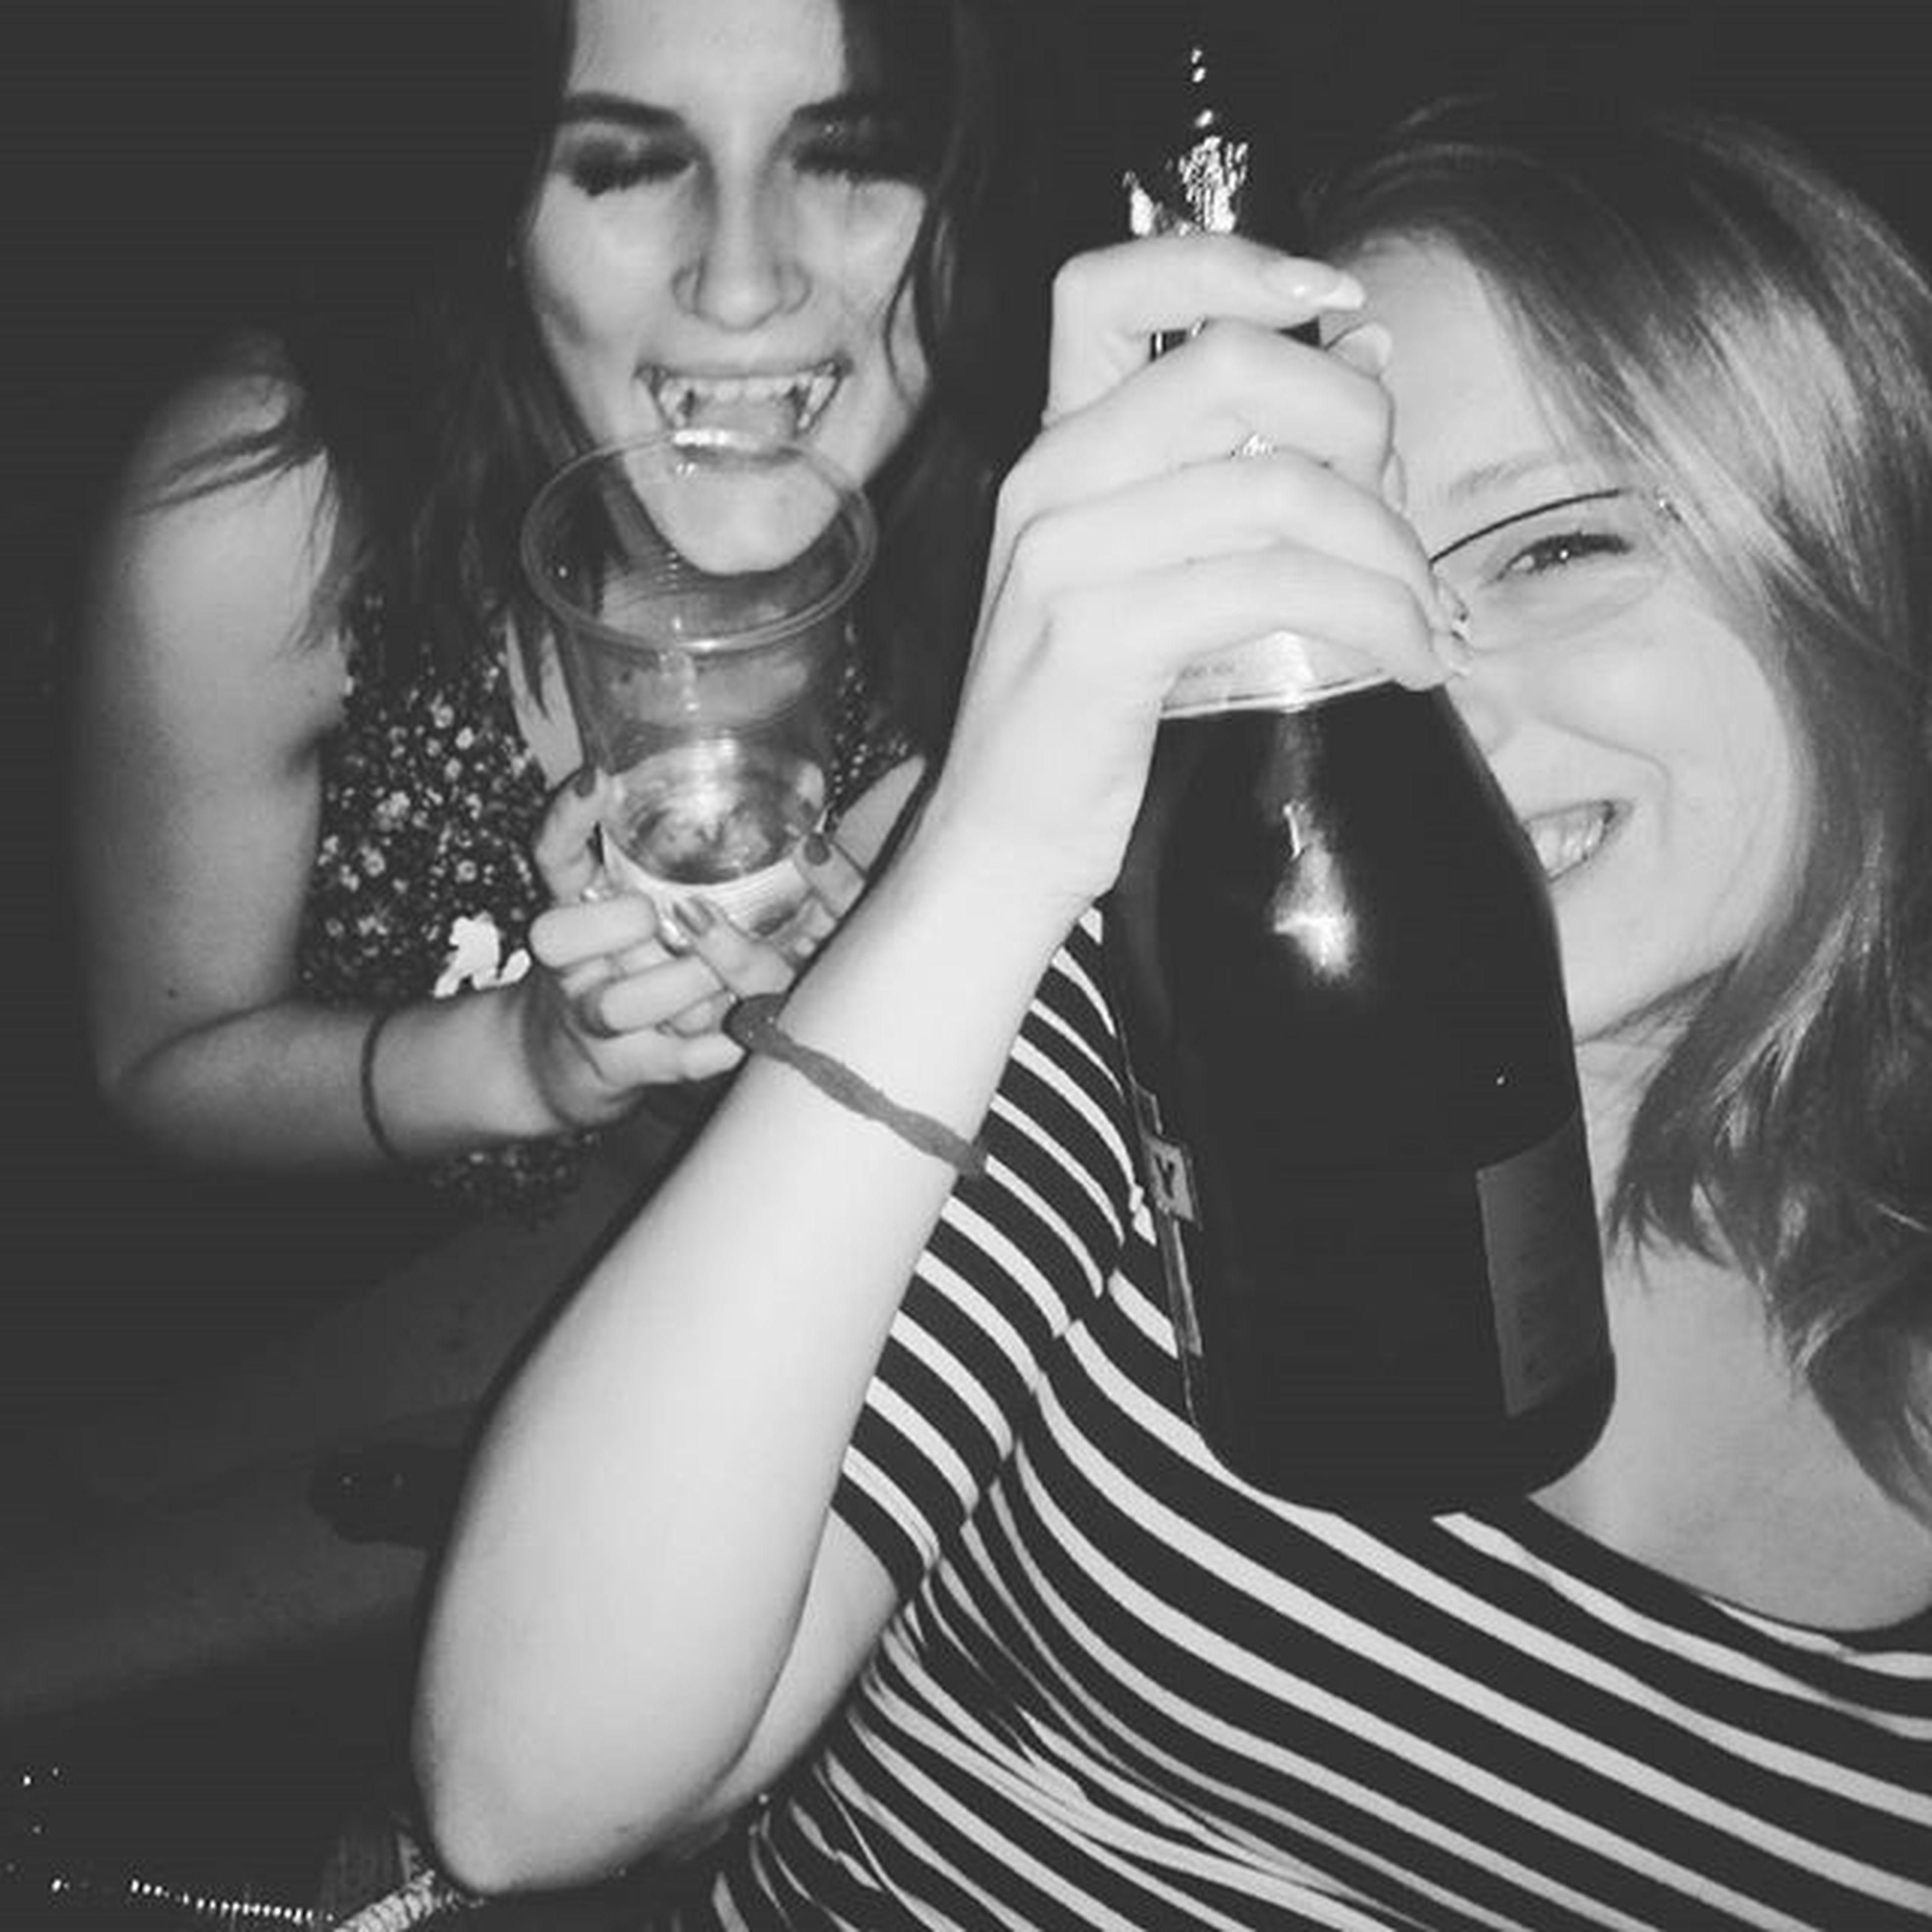 imadom 💞💞💞 Friend Party Night Chill Houseparty Drank Fun Mik Hungarygirls Classmates Boldogszulinapotjasi Orulazinninek Love